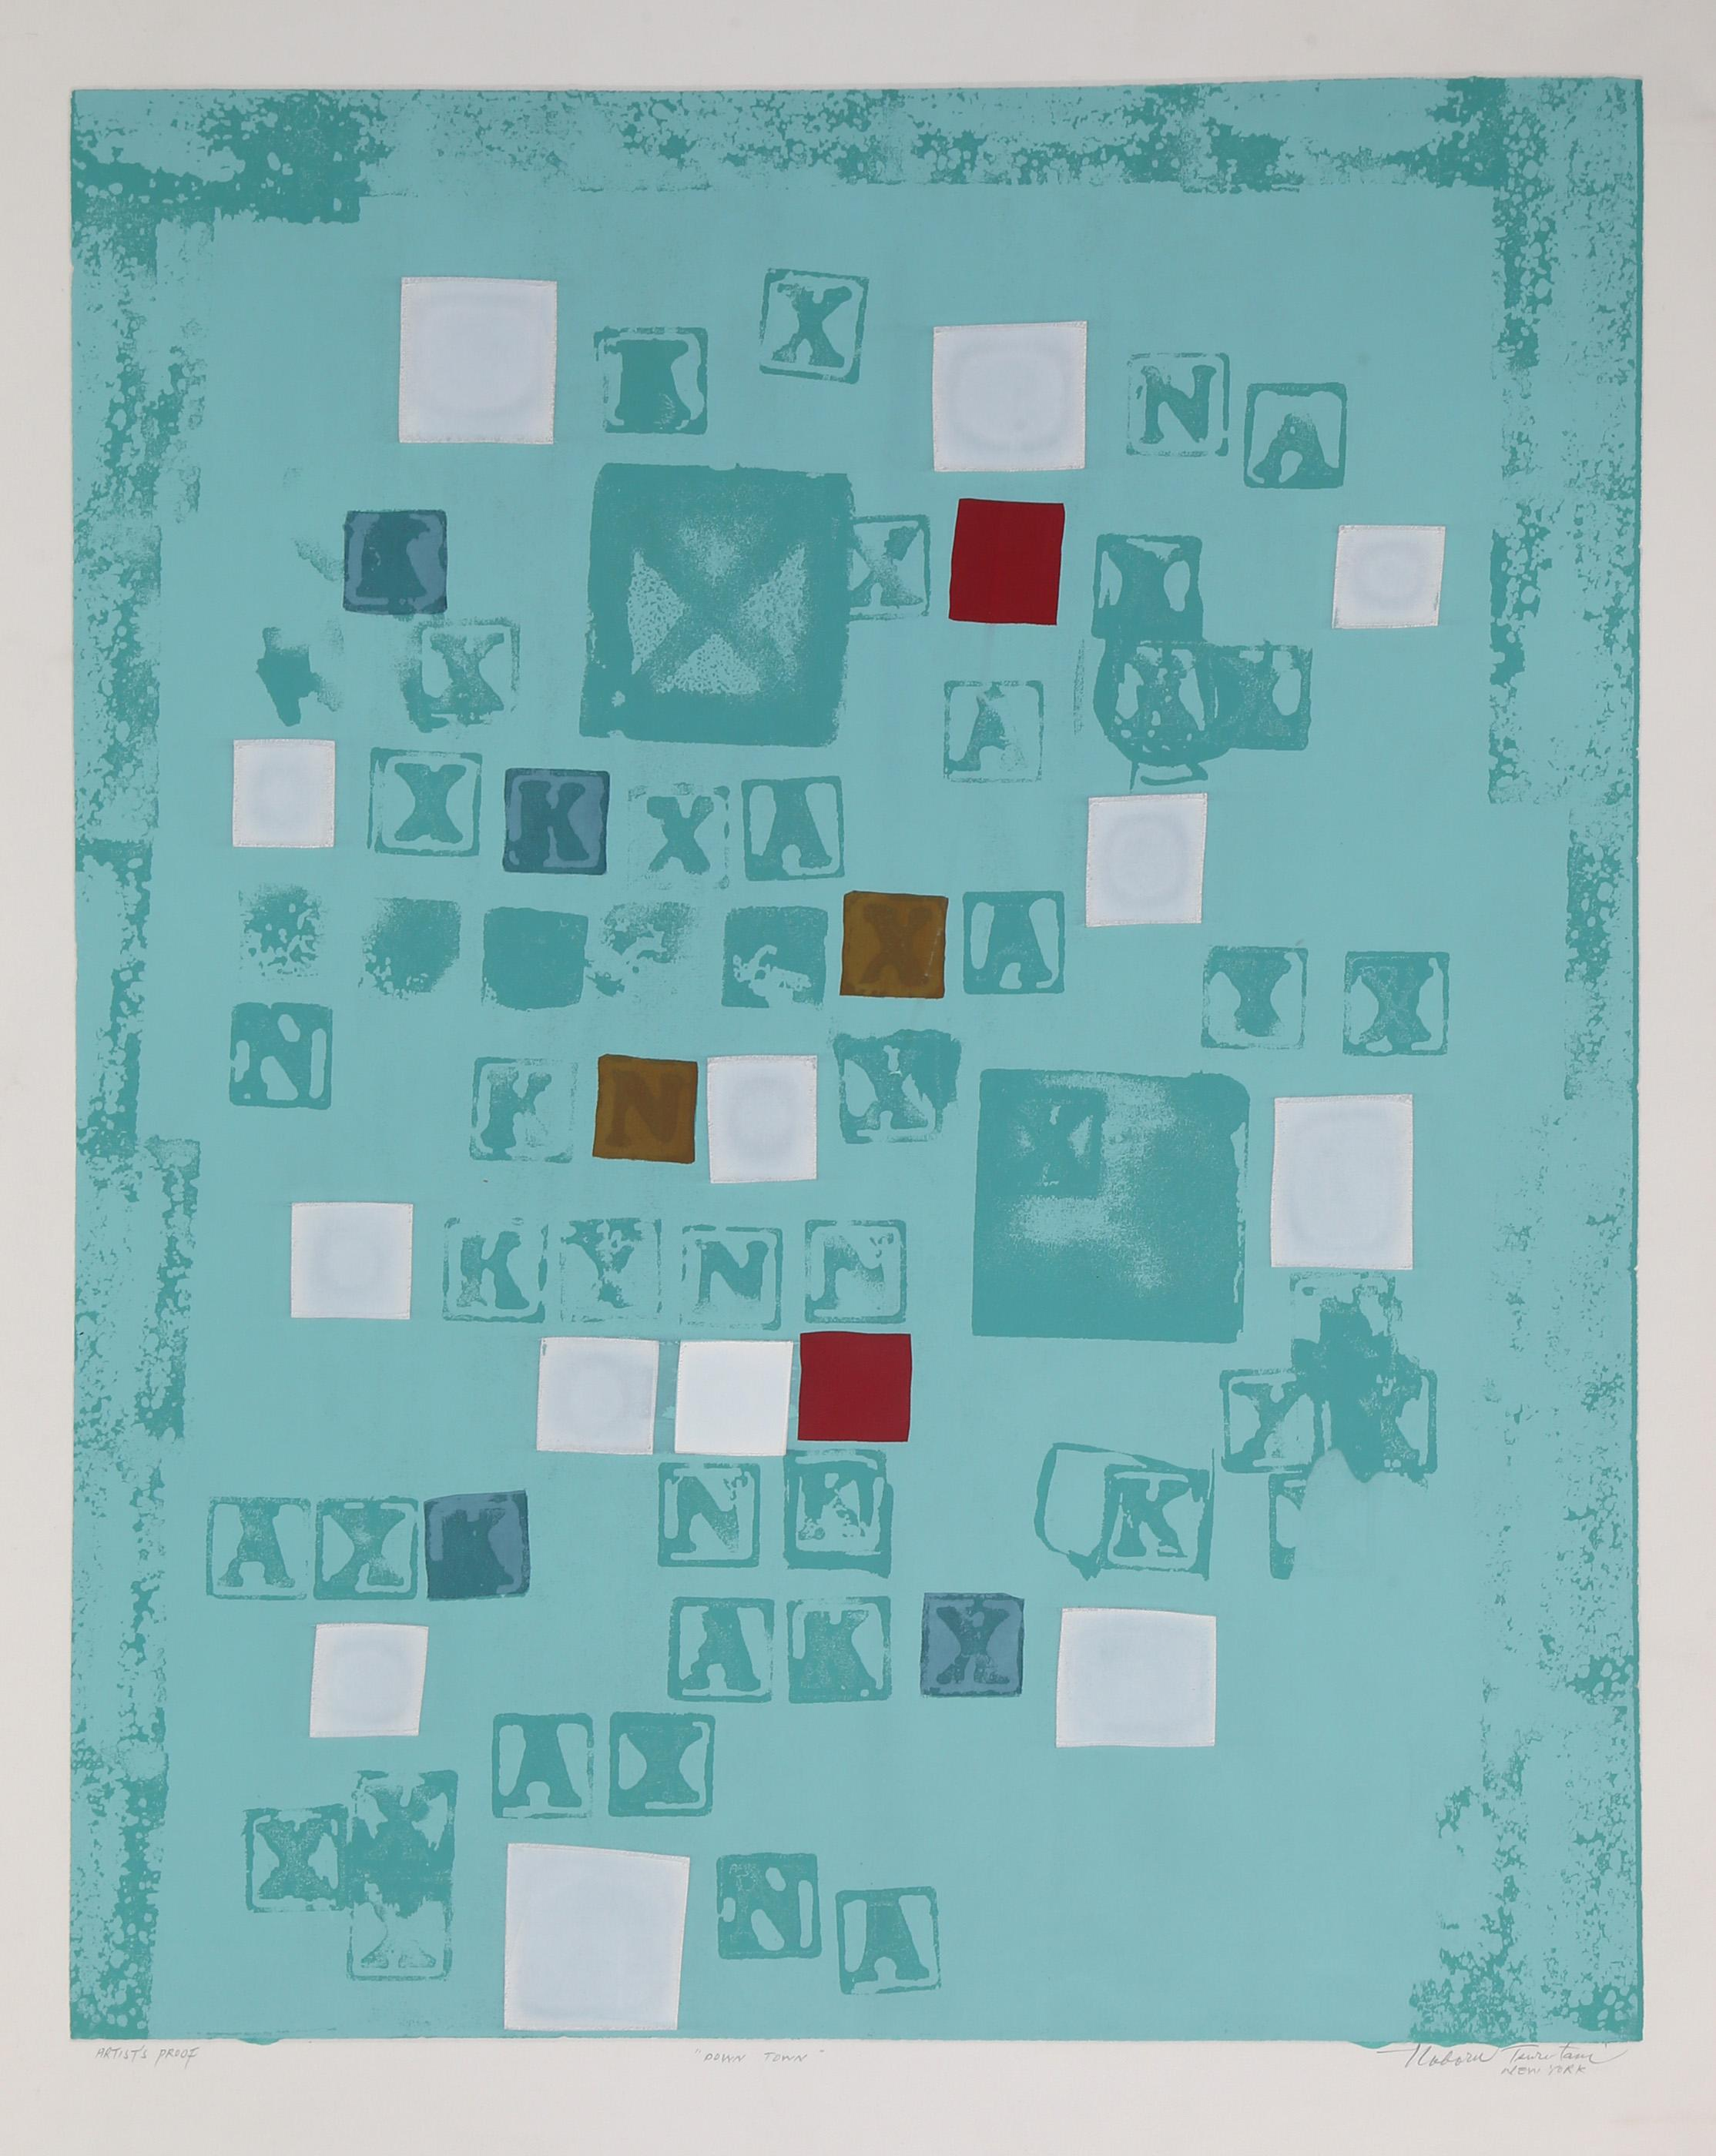 Noboru Tsurutani, Down Town, Relief Print with Wood Type